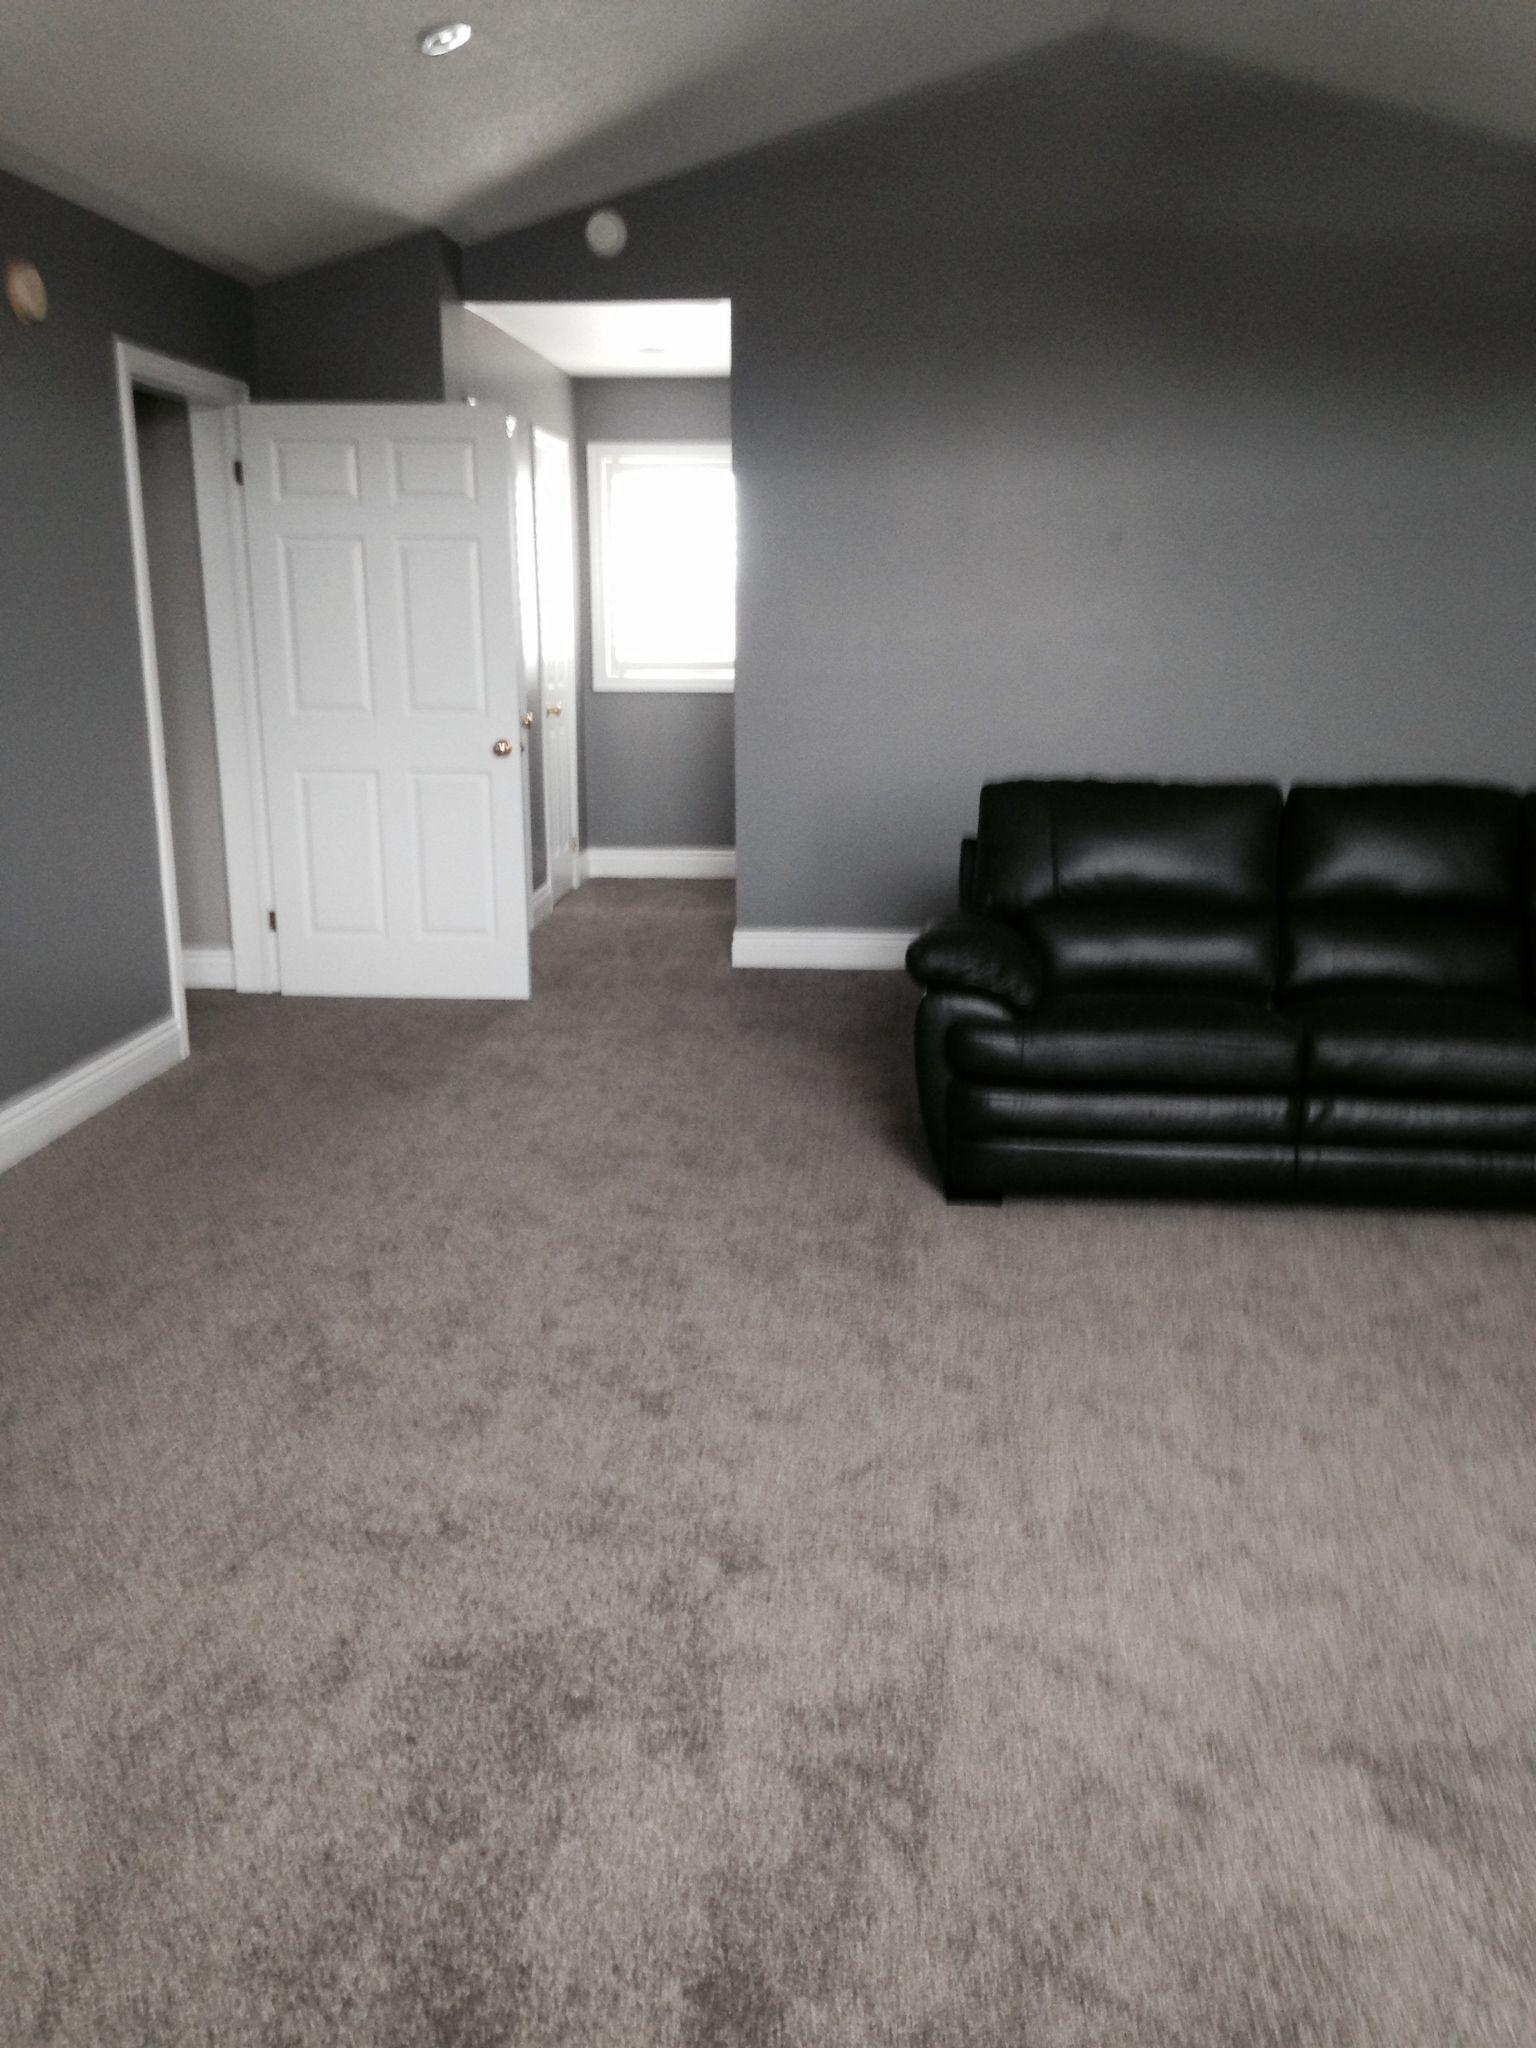 Most Recent Photographs Grey Carpet Ideas Ideas Choosing The Right Carpet Colour Could Be A D In 2021 Grey Carpet Living Room Grey Walls And Carpet Grey Carpet Bedroom